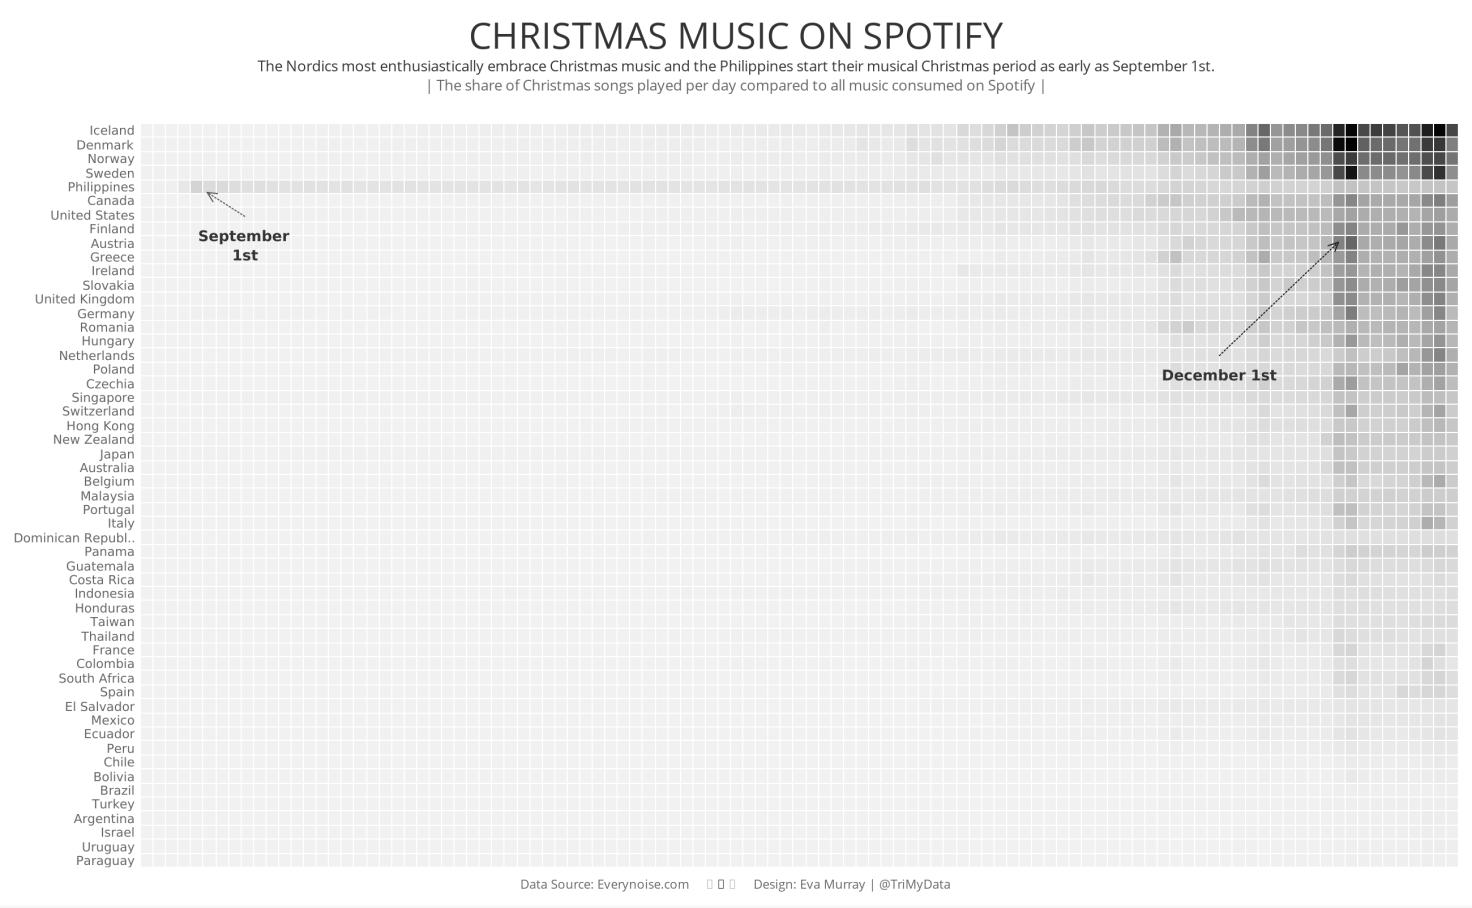 Spotify Christmas Music Eva Murray Tableau Public